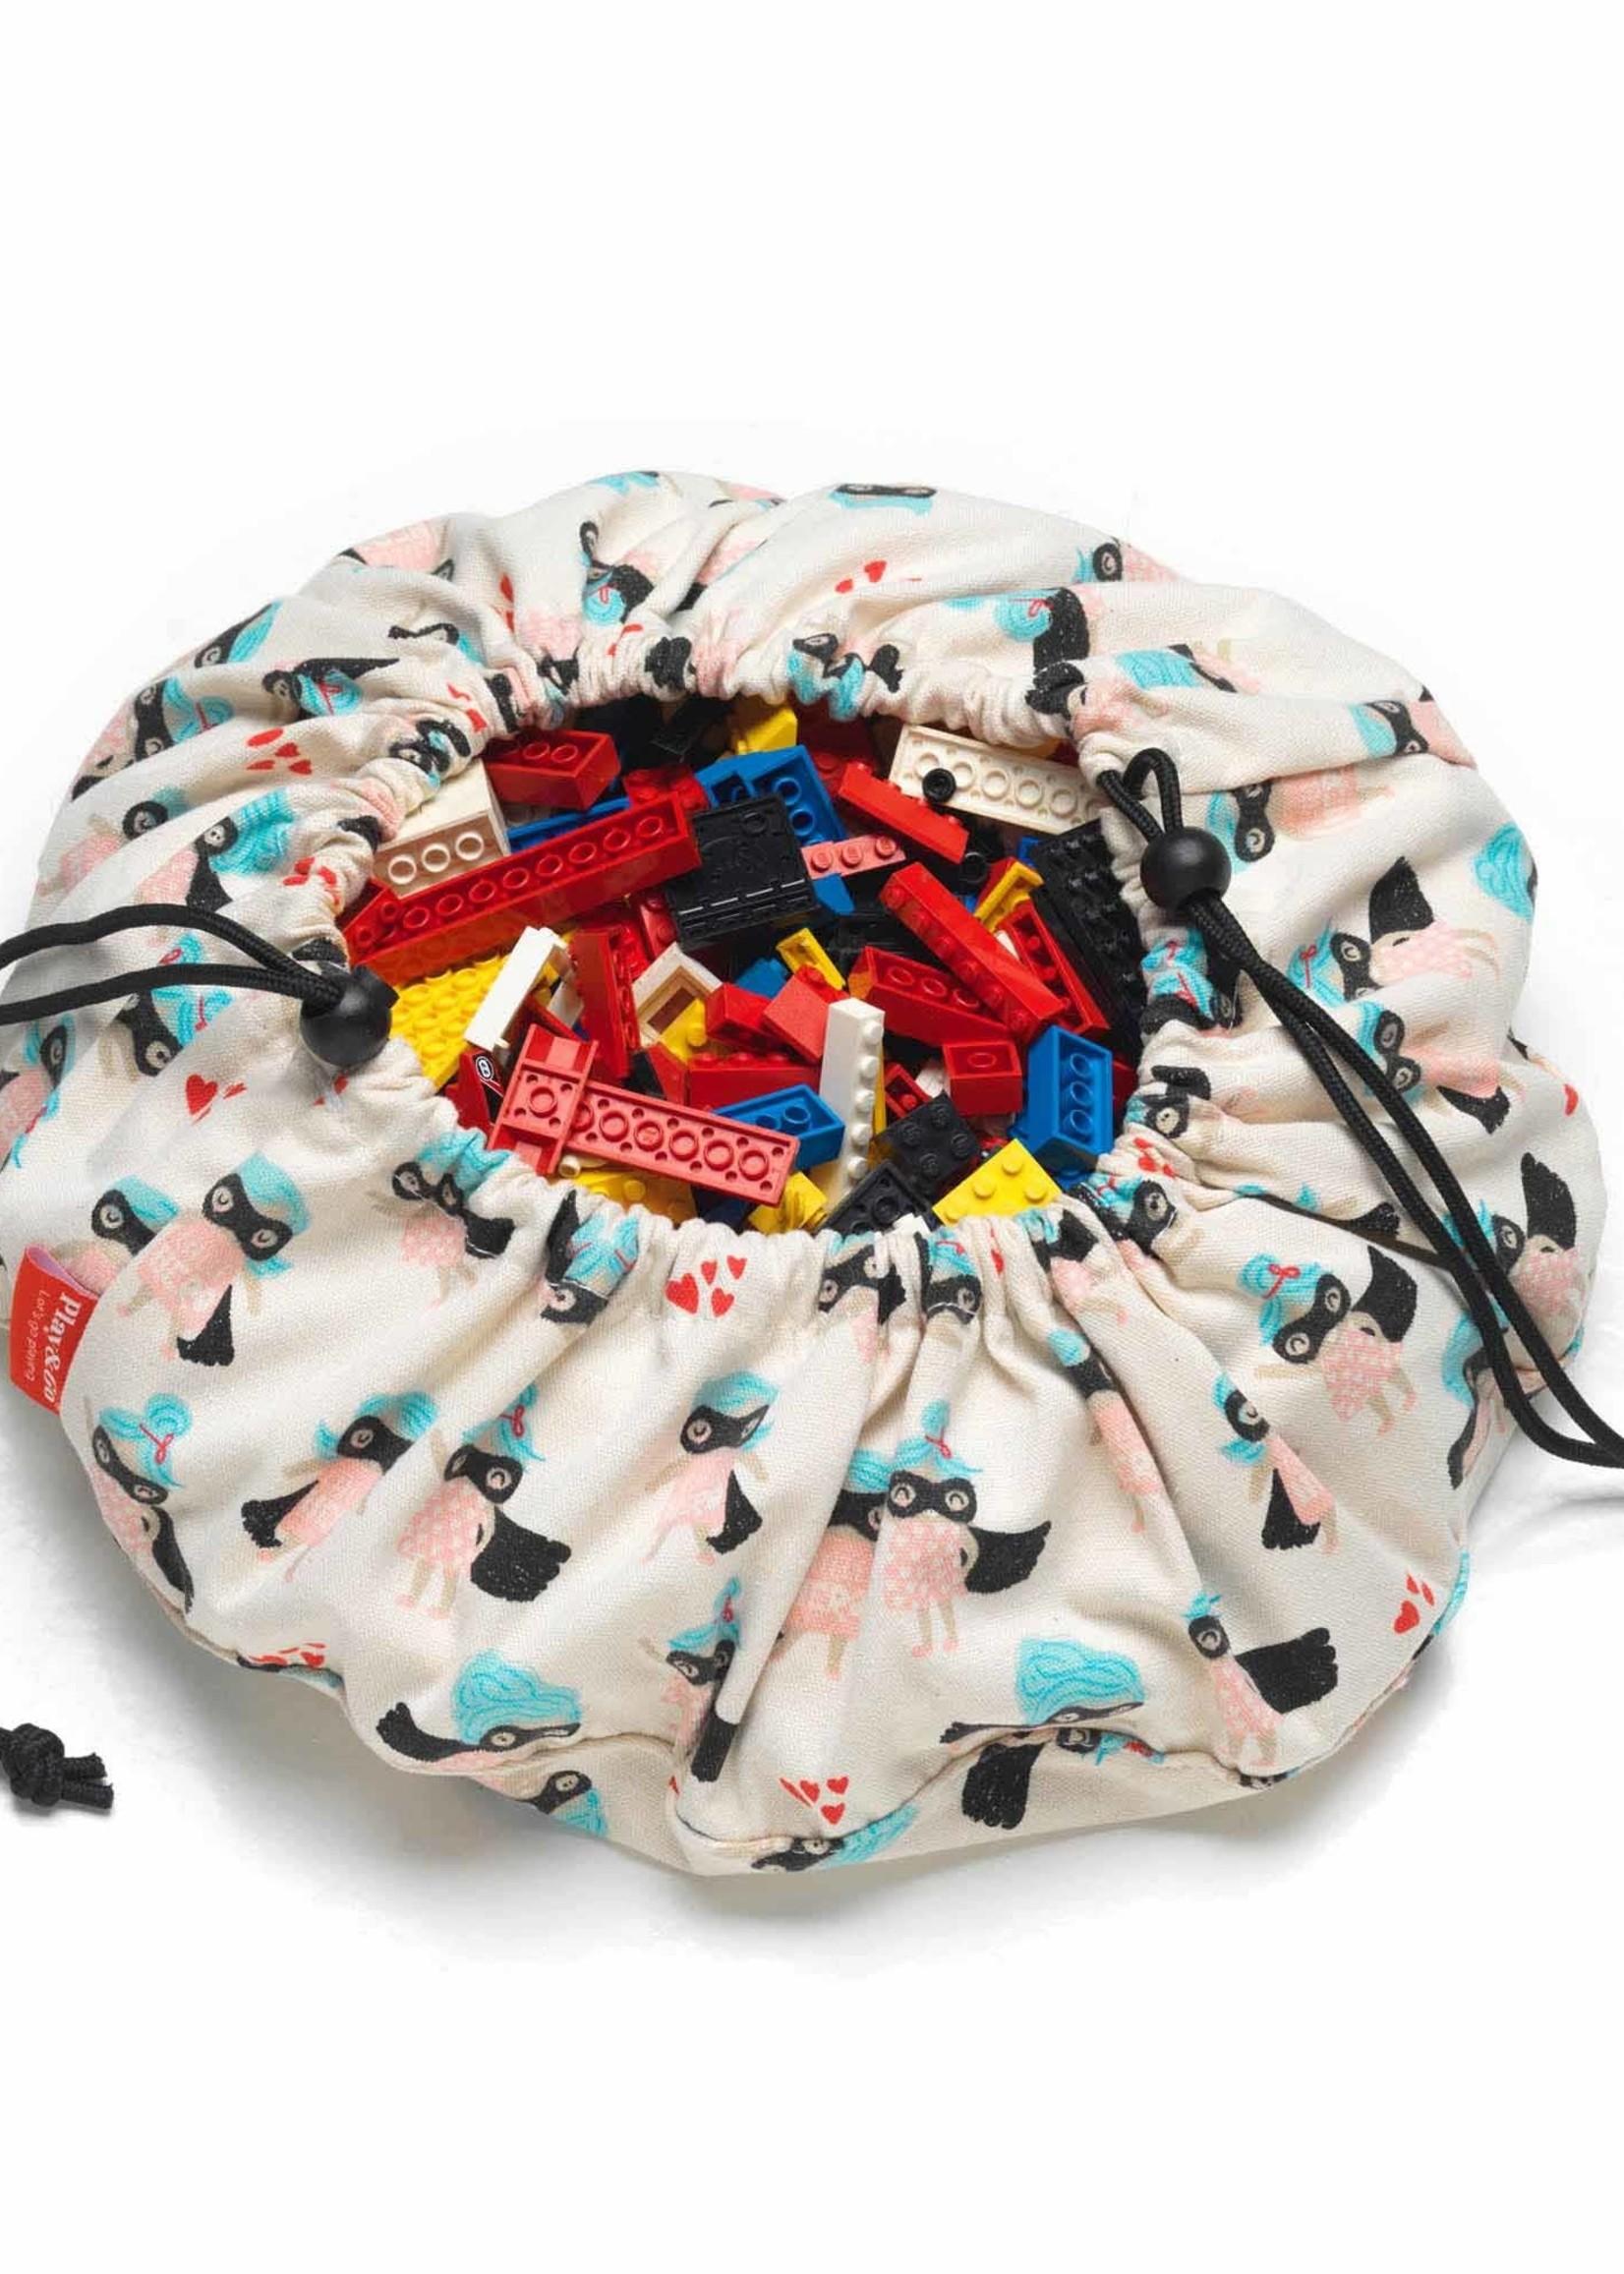 play & go Supergirl mini toy storage bag